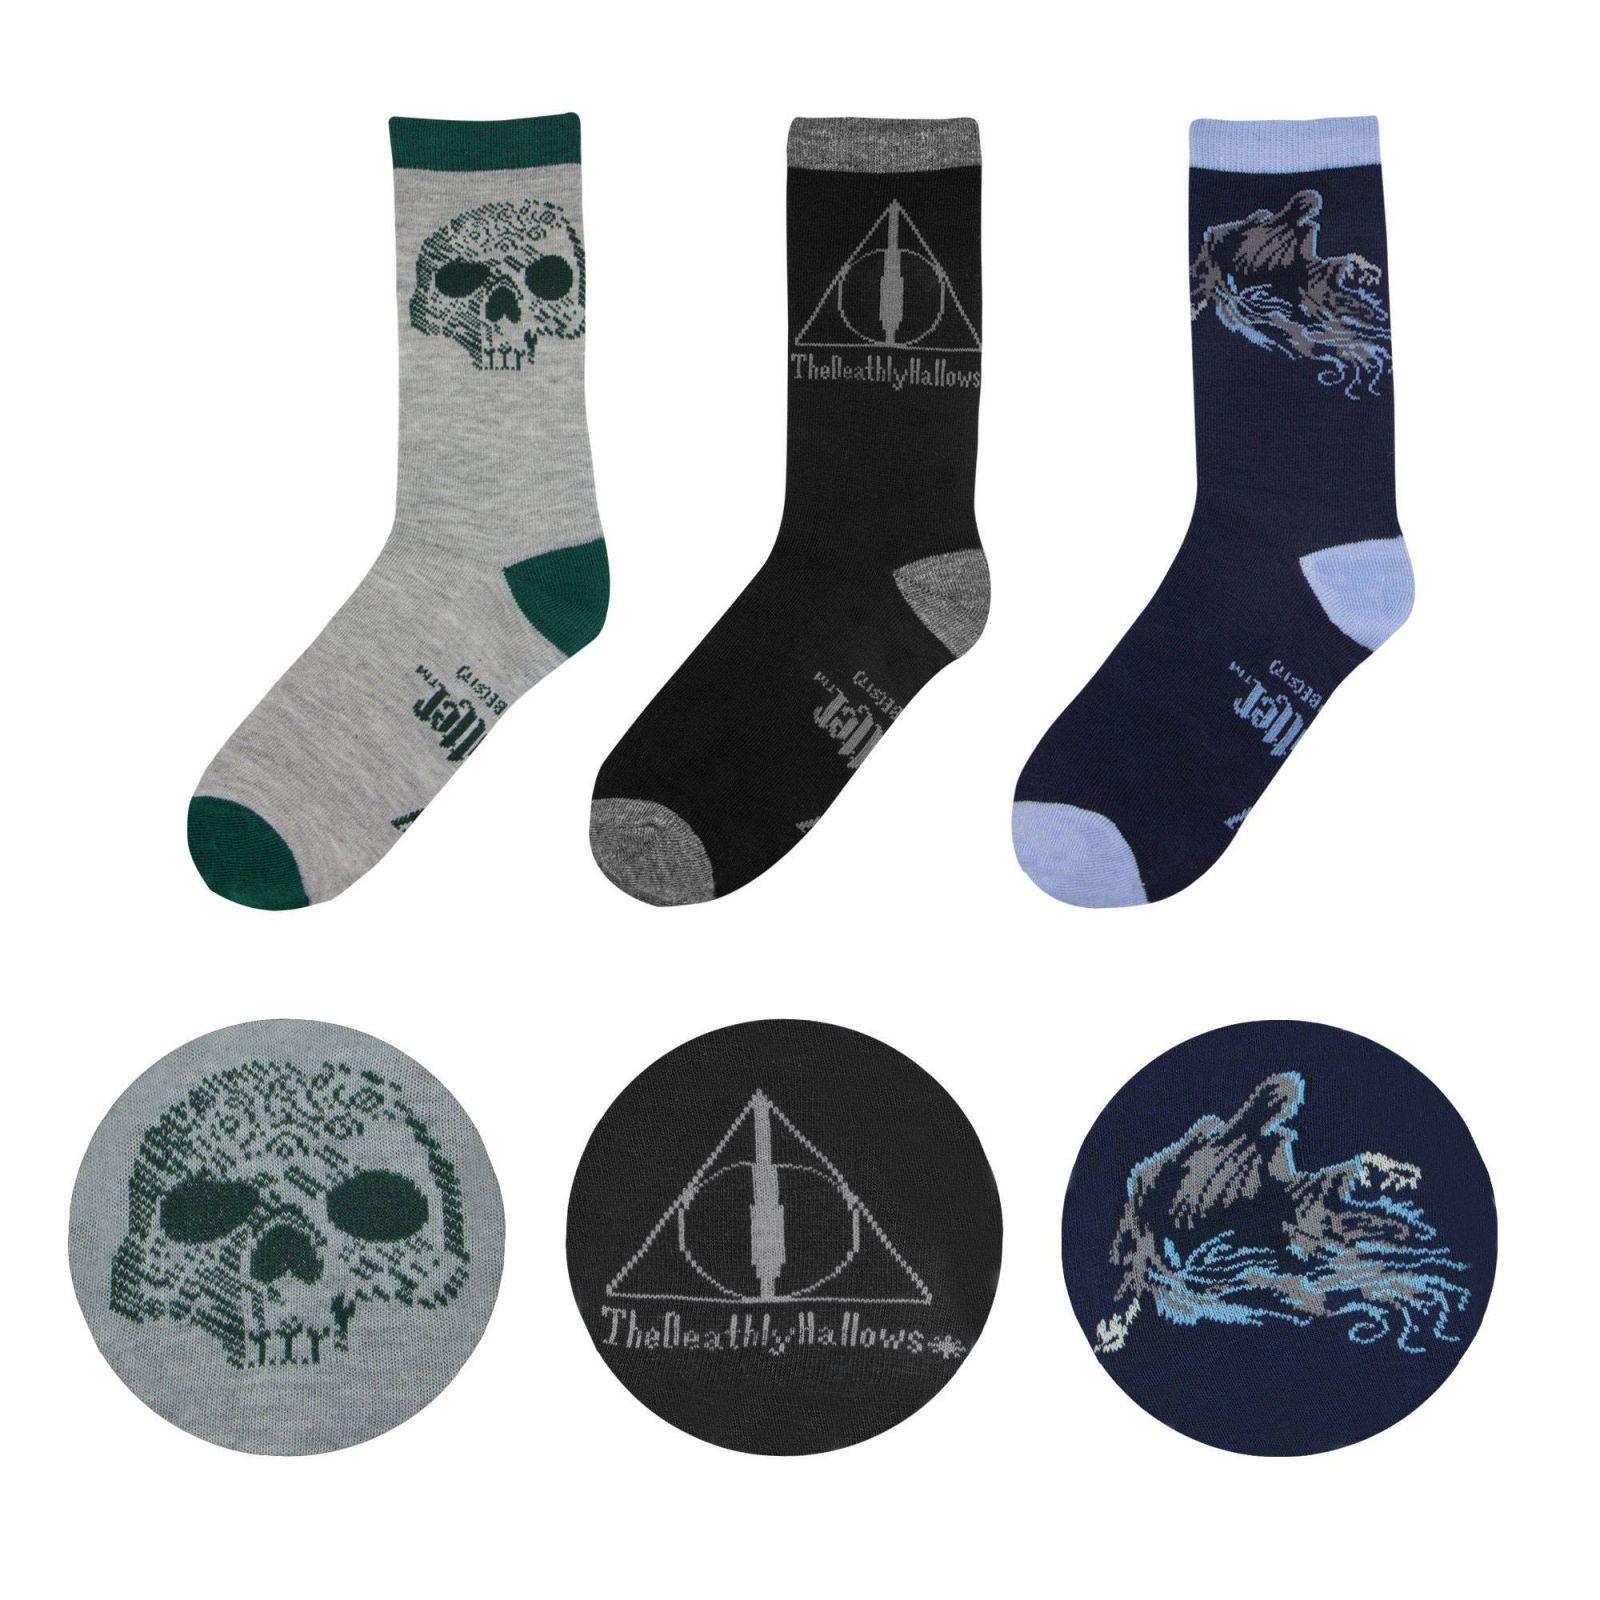 760938eac38 Harry Potter Ponožky 3-Pack Deathly Hallows Cinereplicas